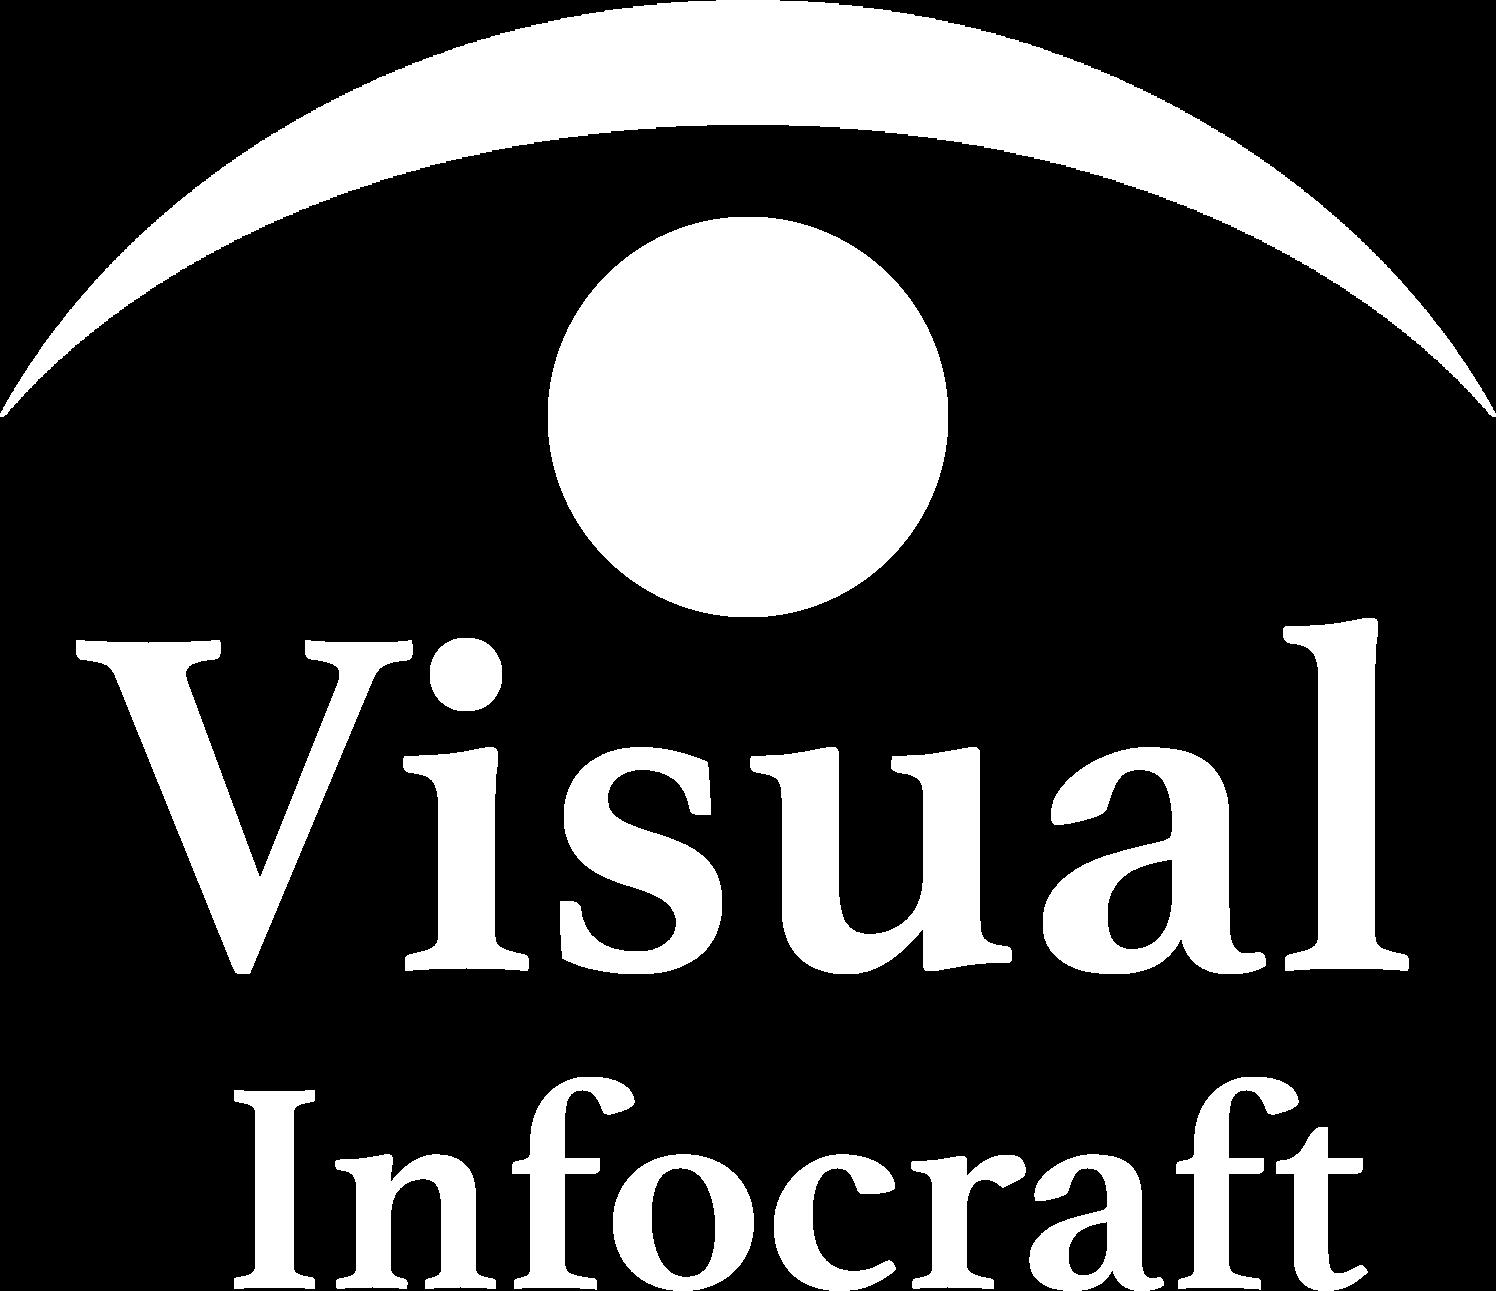 Visual Infocraft